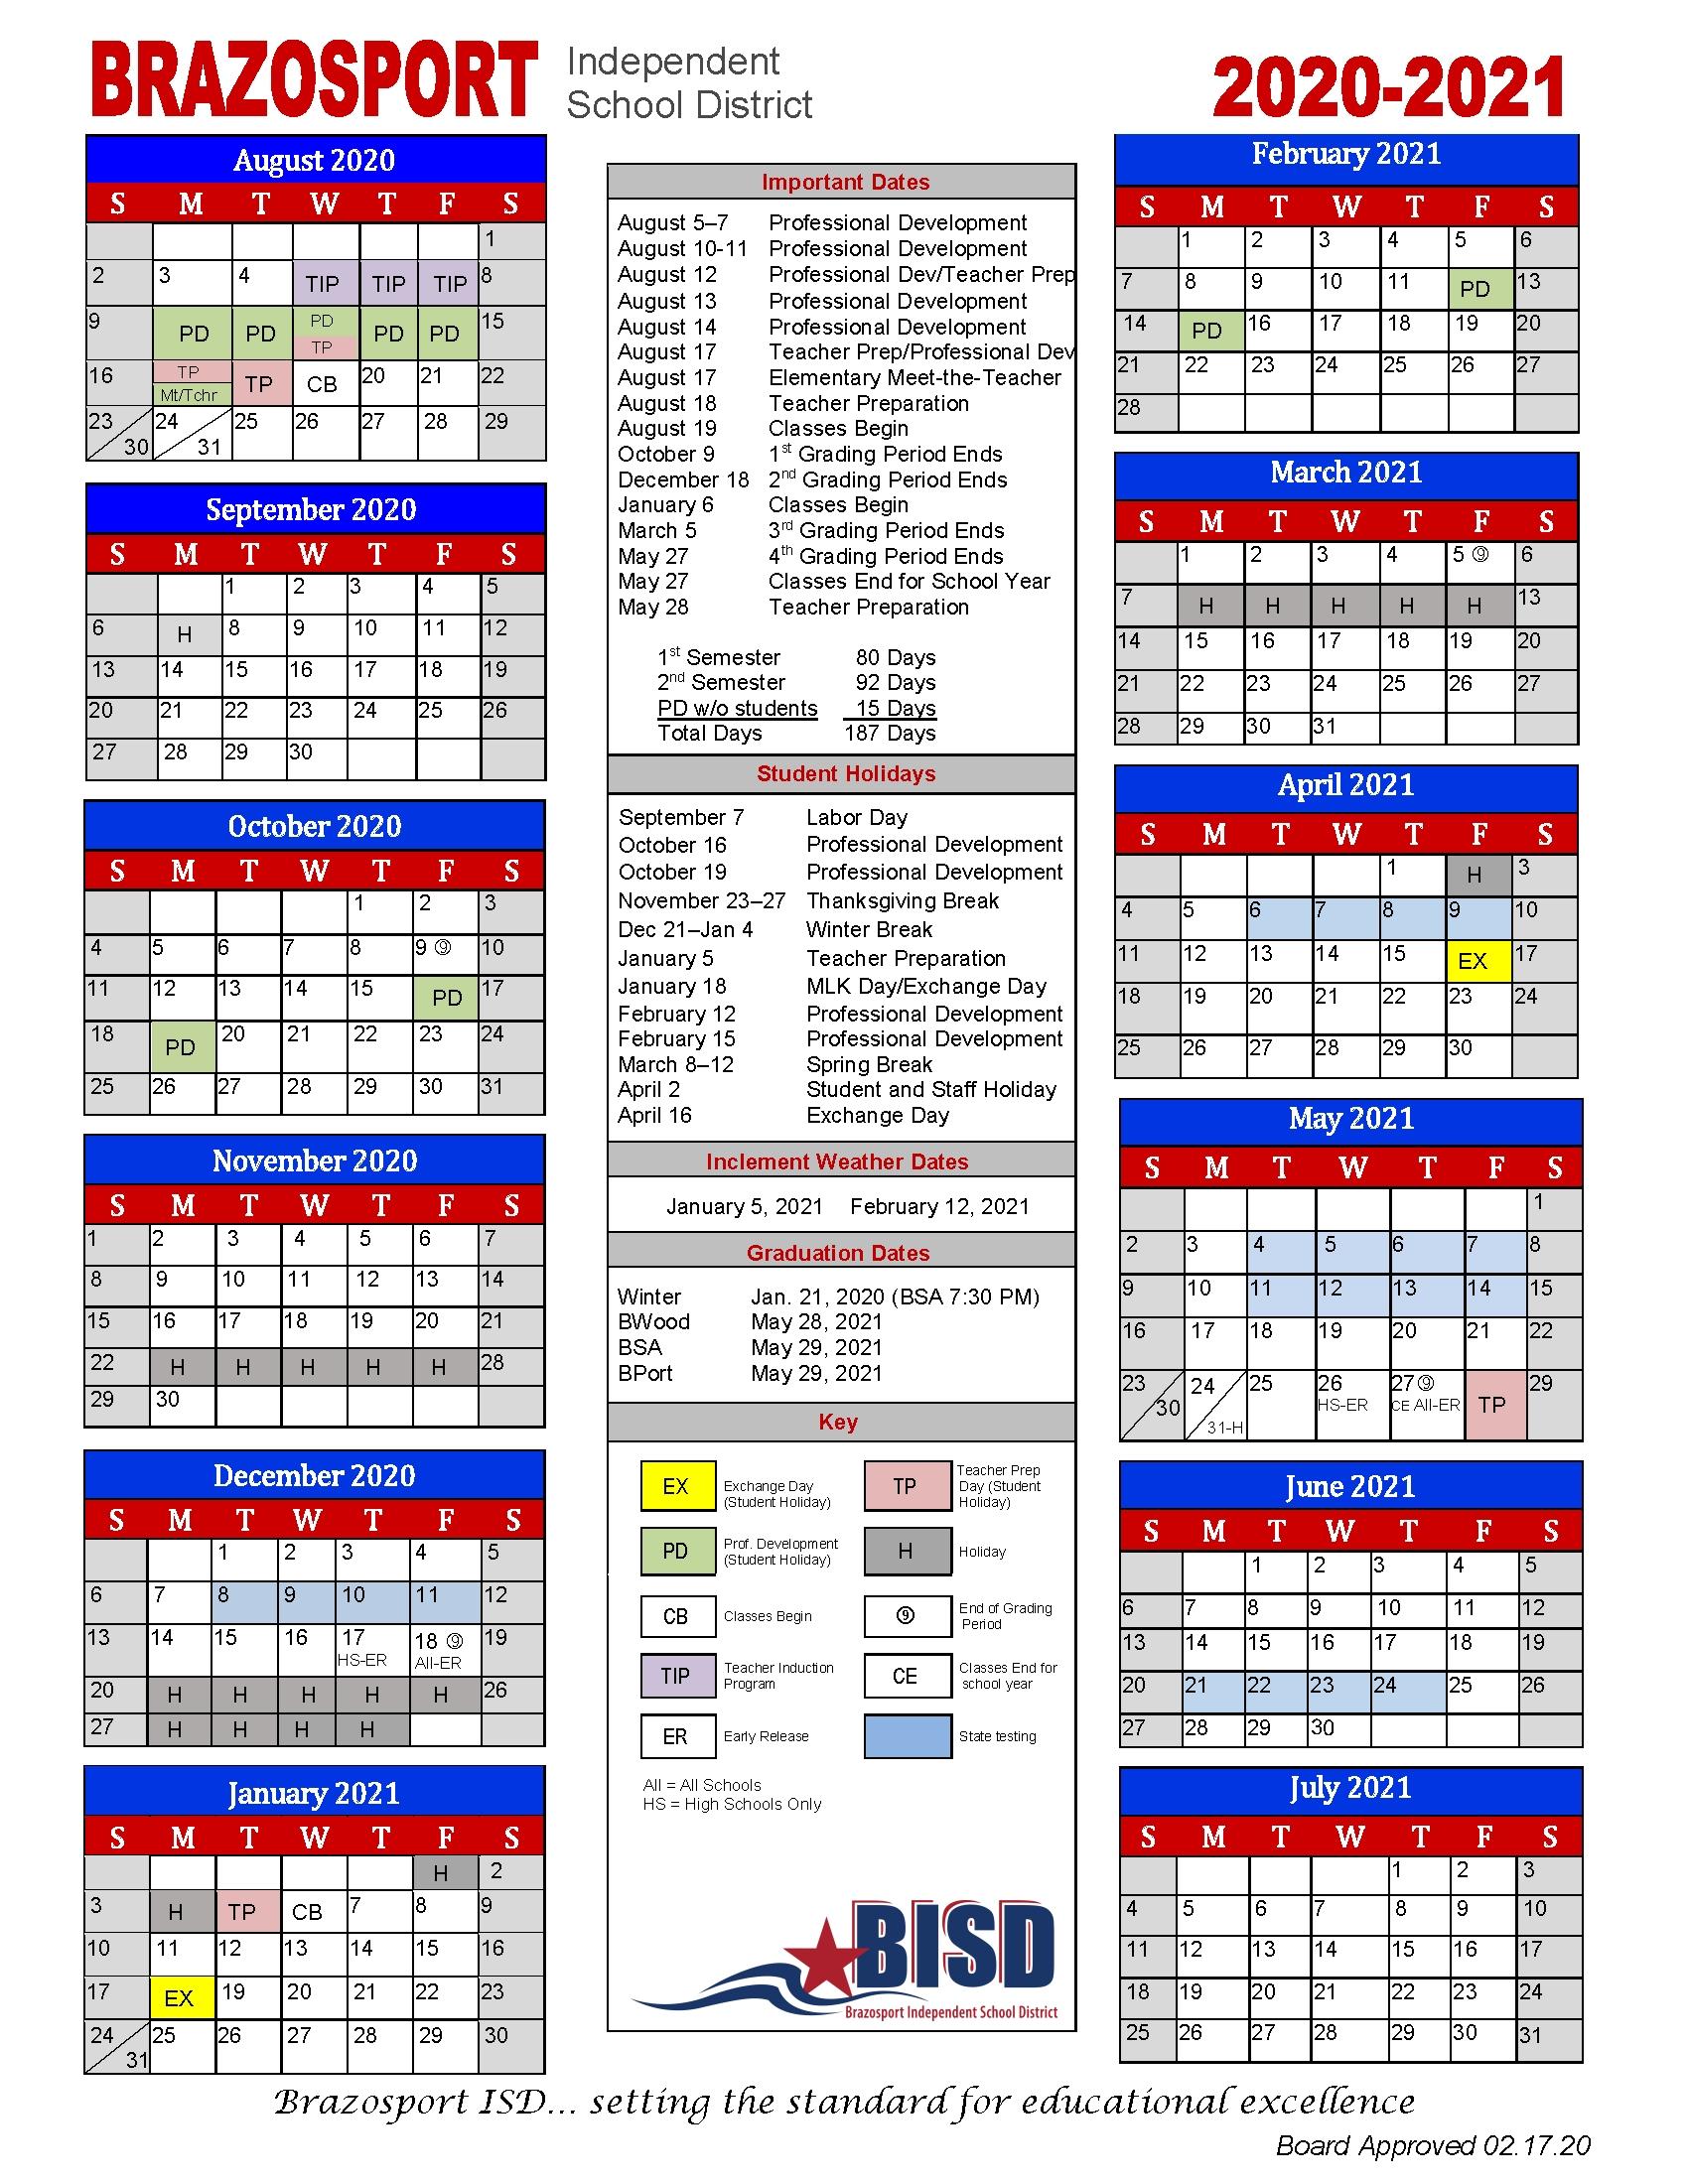 Board Approves 2020-2021 School Calendar - Brazosport with regard to Stephen F Austin Calendar 2019-2020